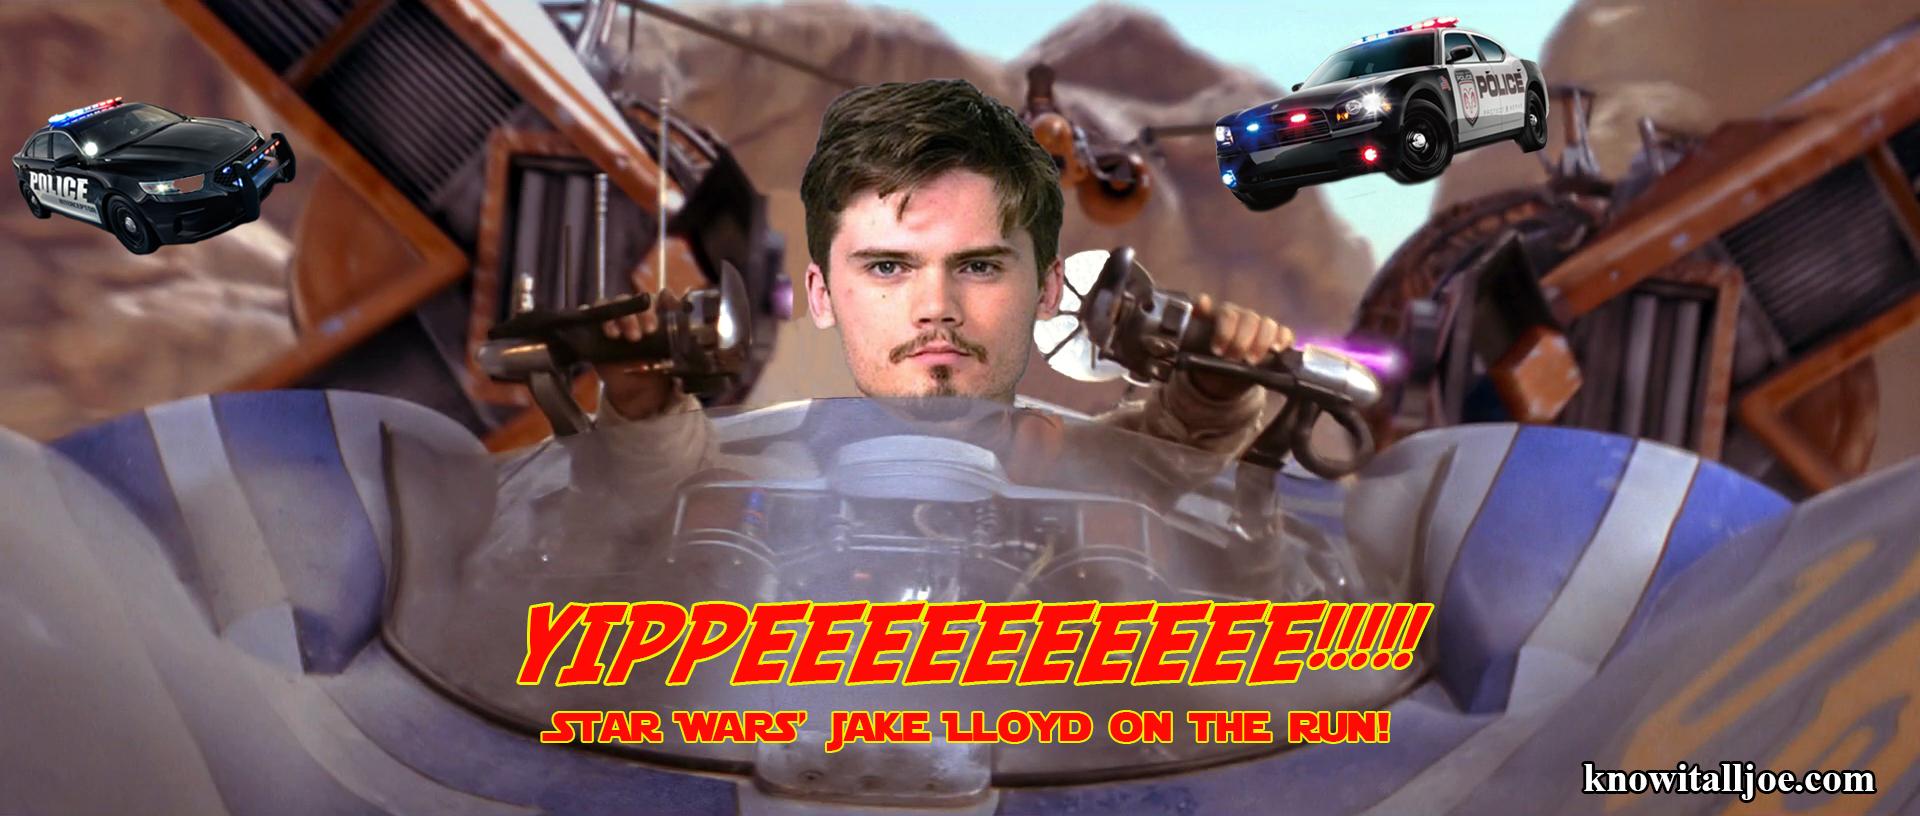 Star wars movie scripts